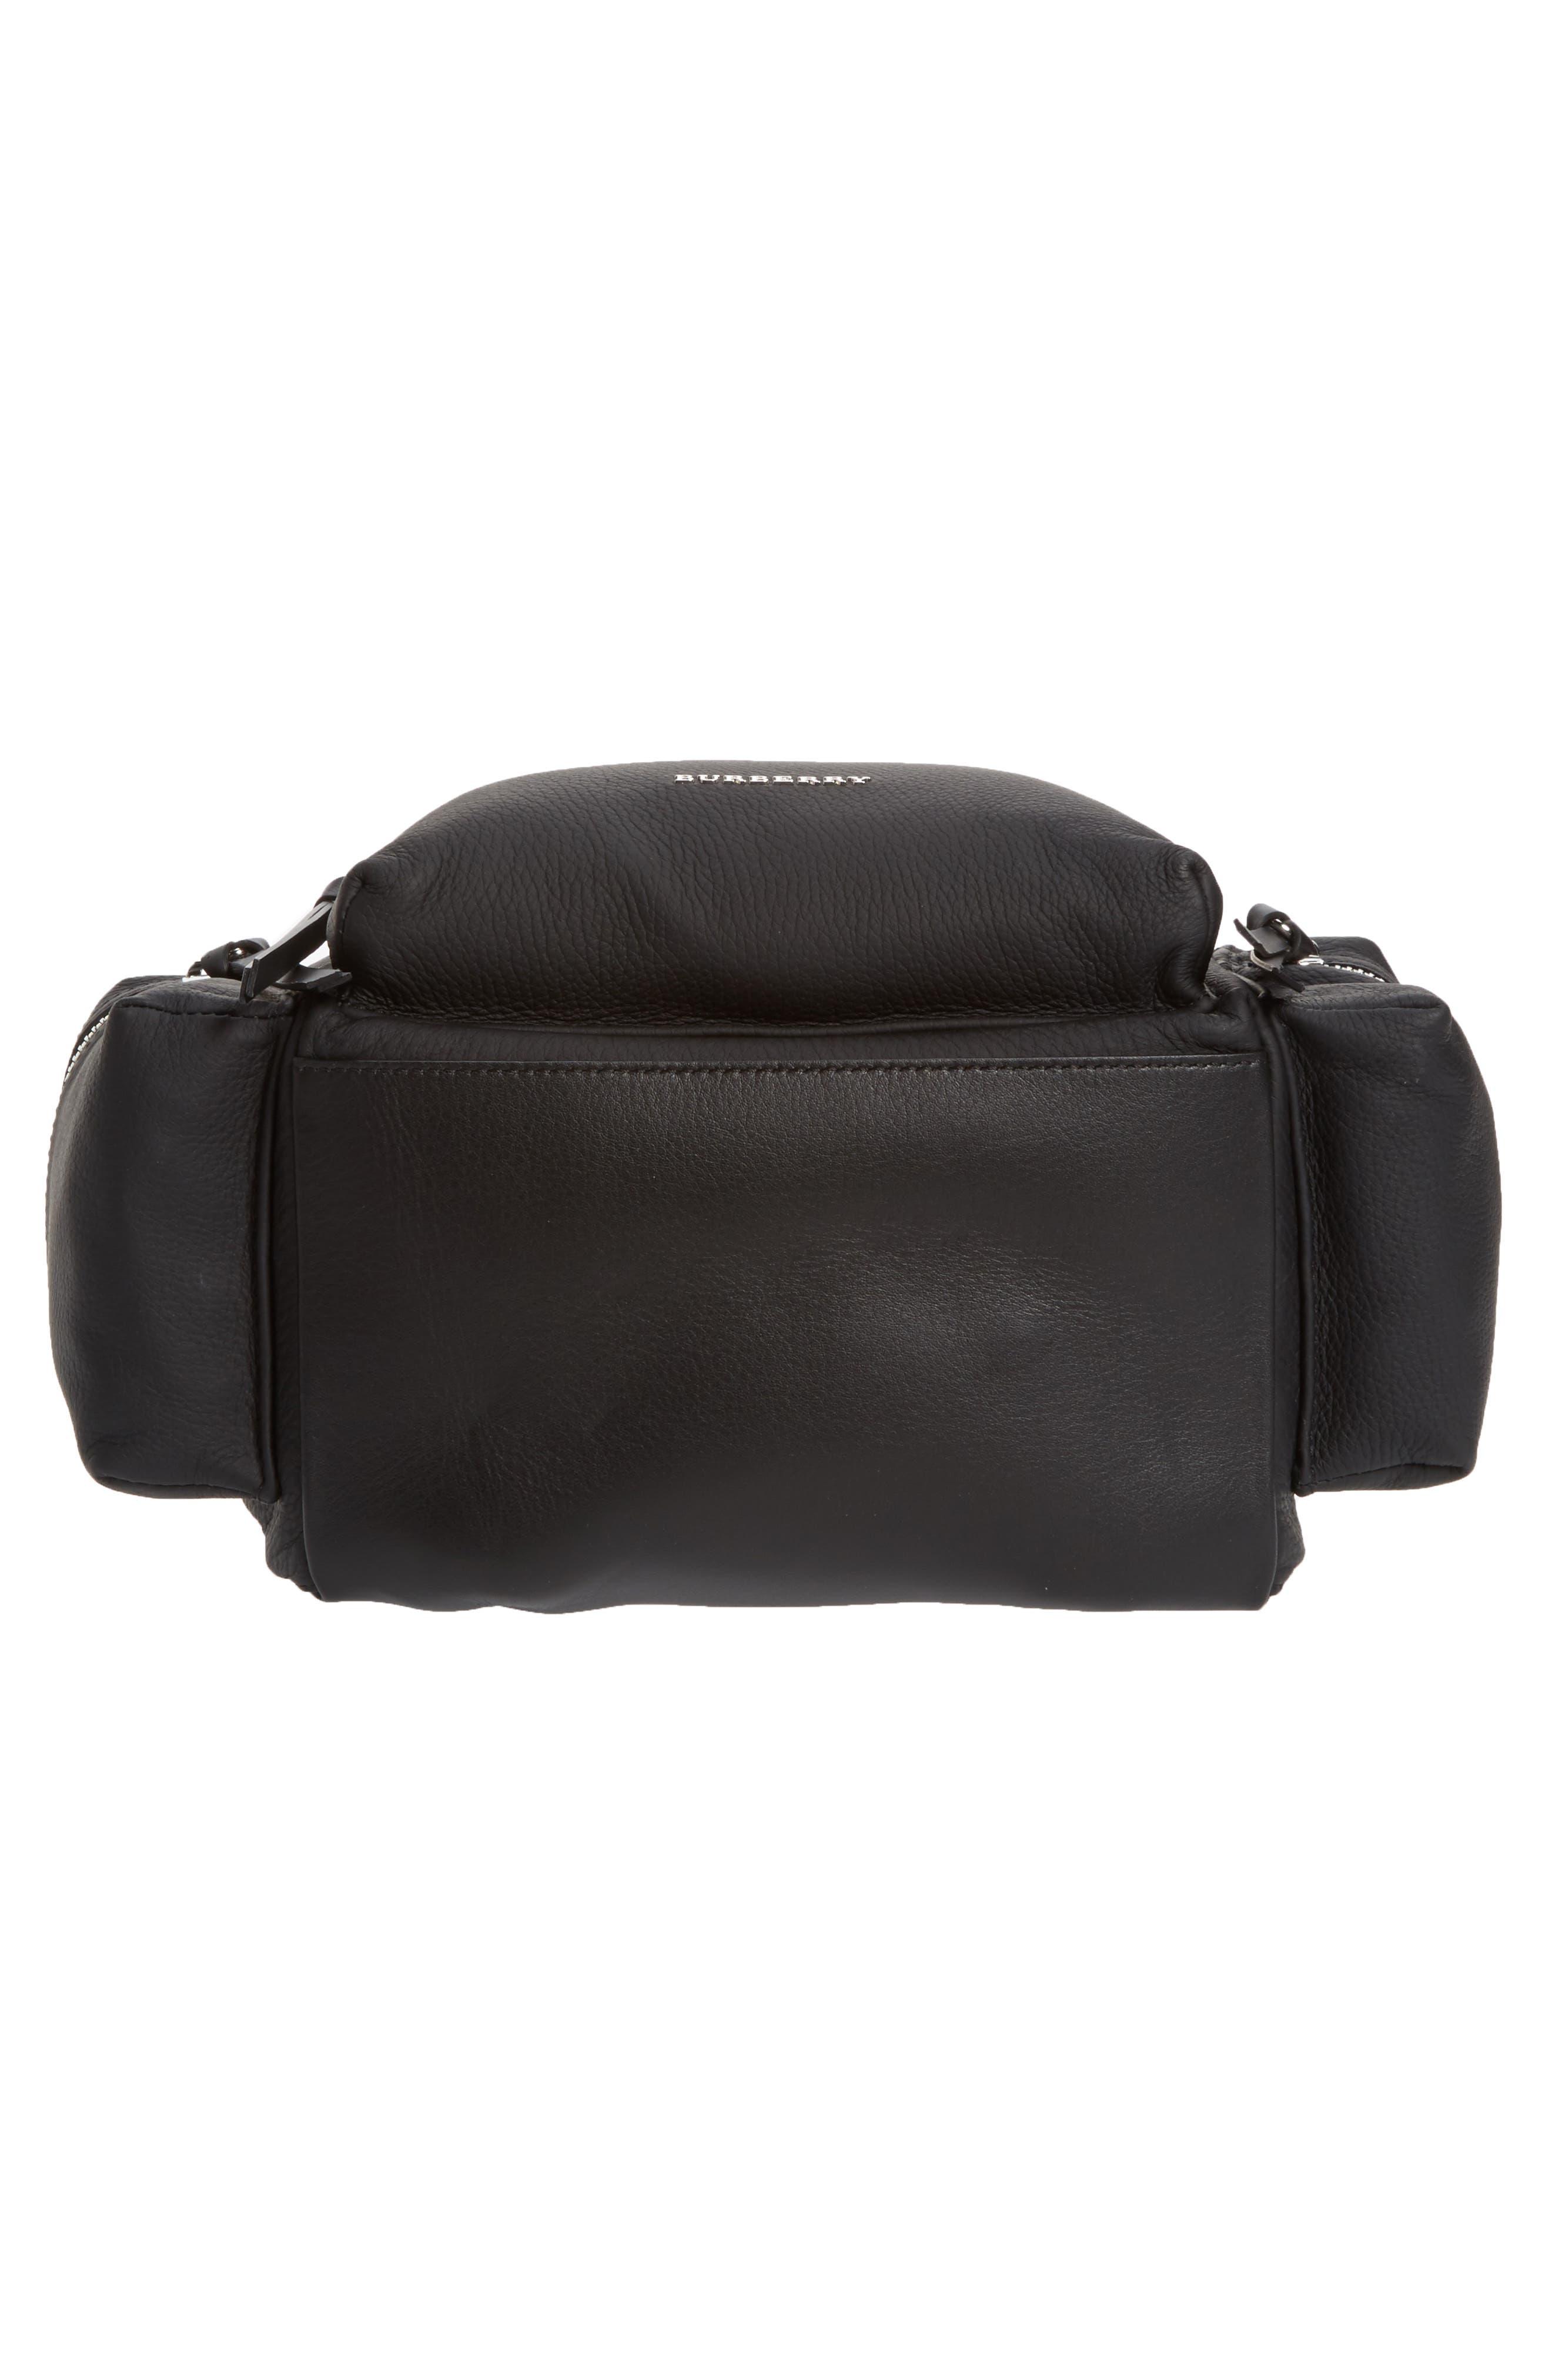 Medium Rucksack Leather Backpack,                             Alternate thumbnail 6, color,